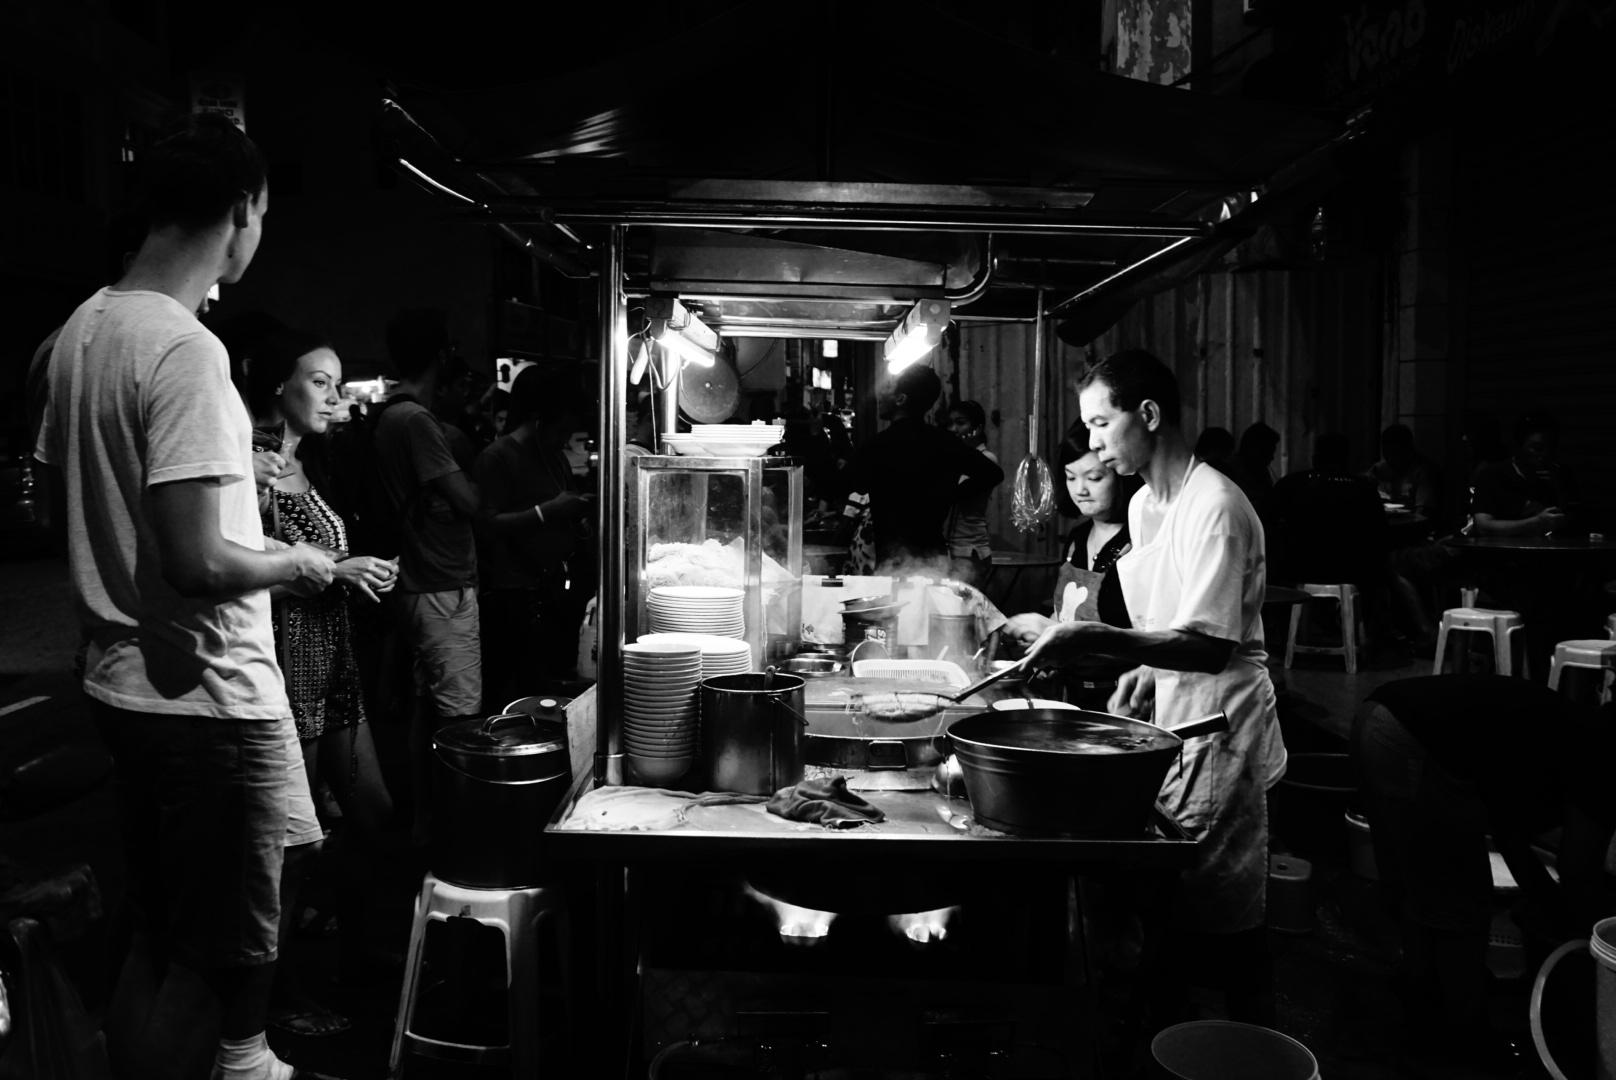 Penang Street Food Vendor Noodles